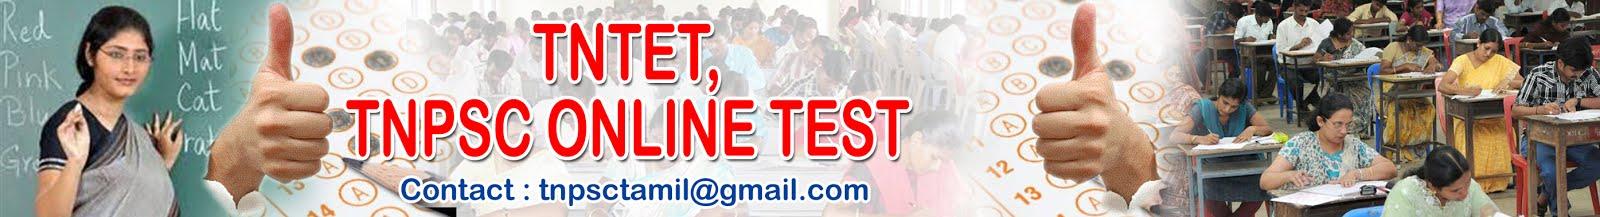 TET, TNPSC ONLINE TEST